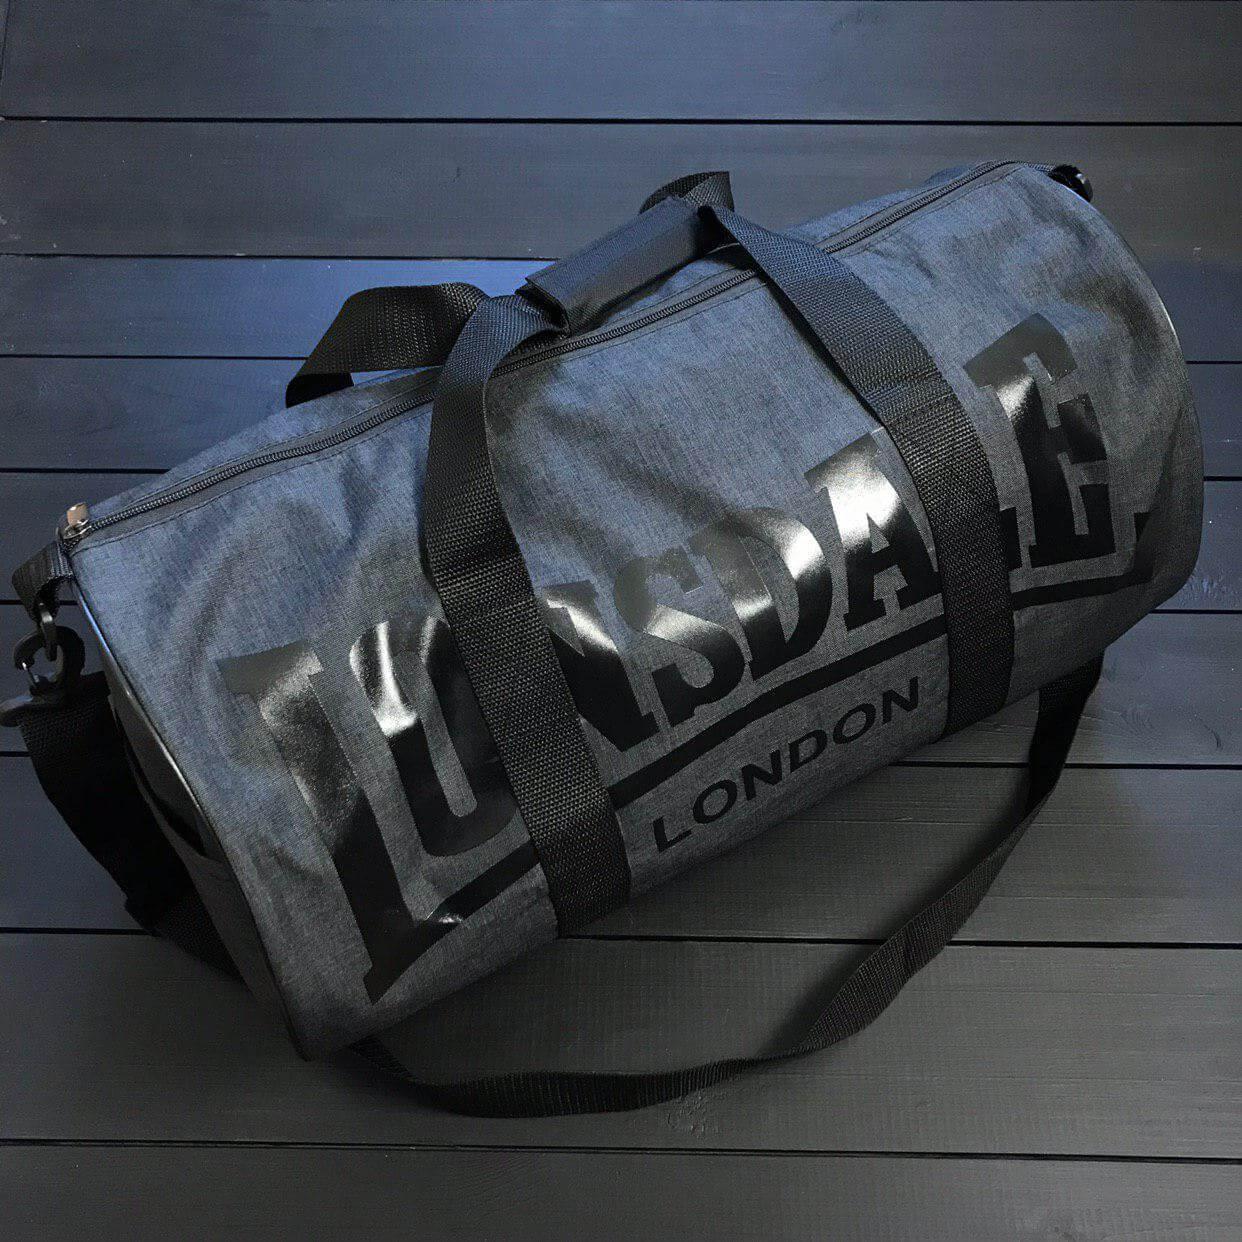 460d946c Недорогая спортивная сумка Lonsdale темно-серого цвета - Интернет магазин  обуви «im-РоLLi